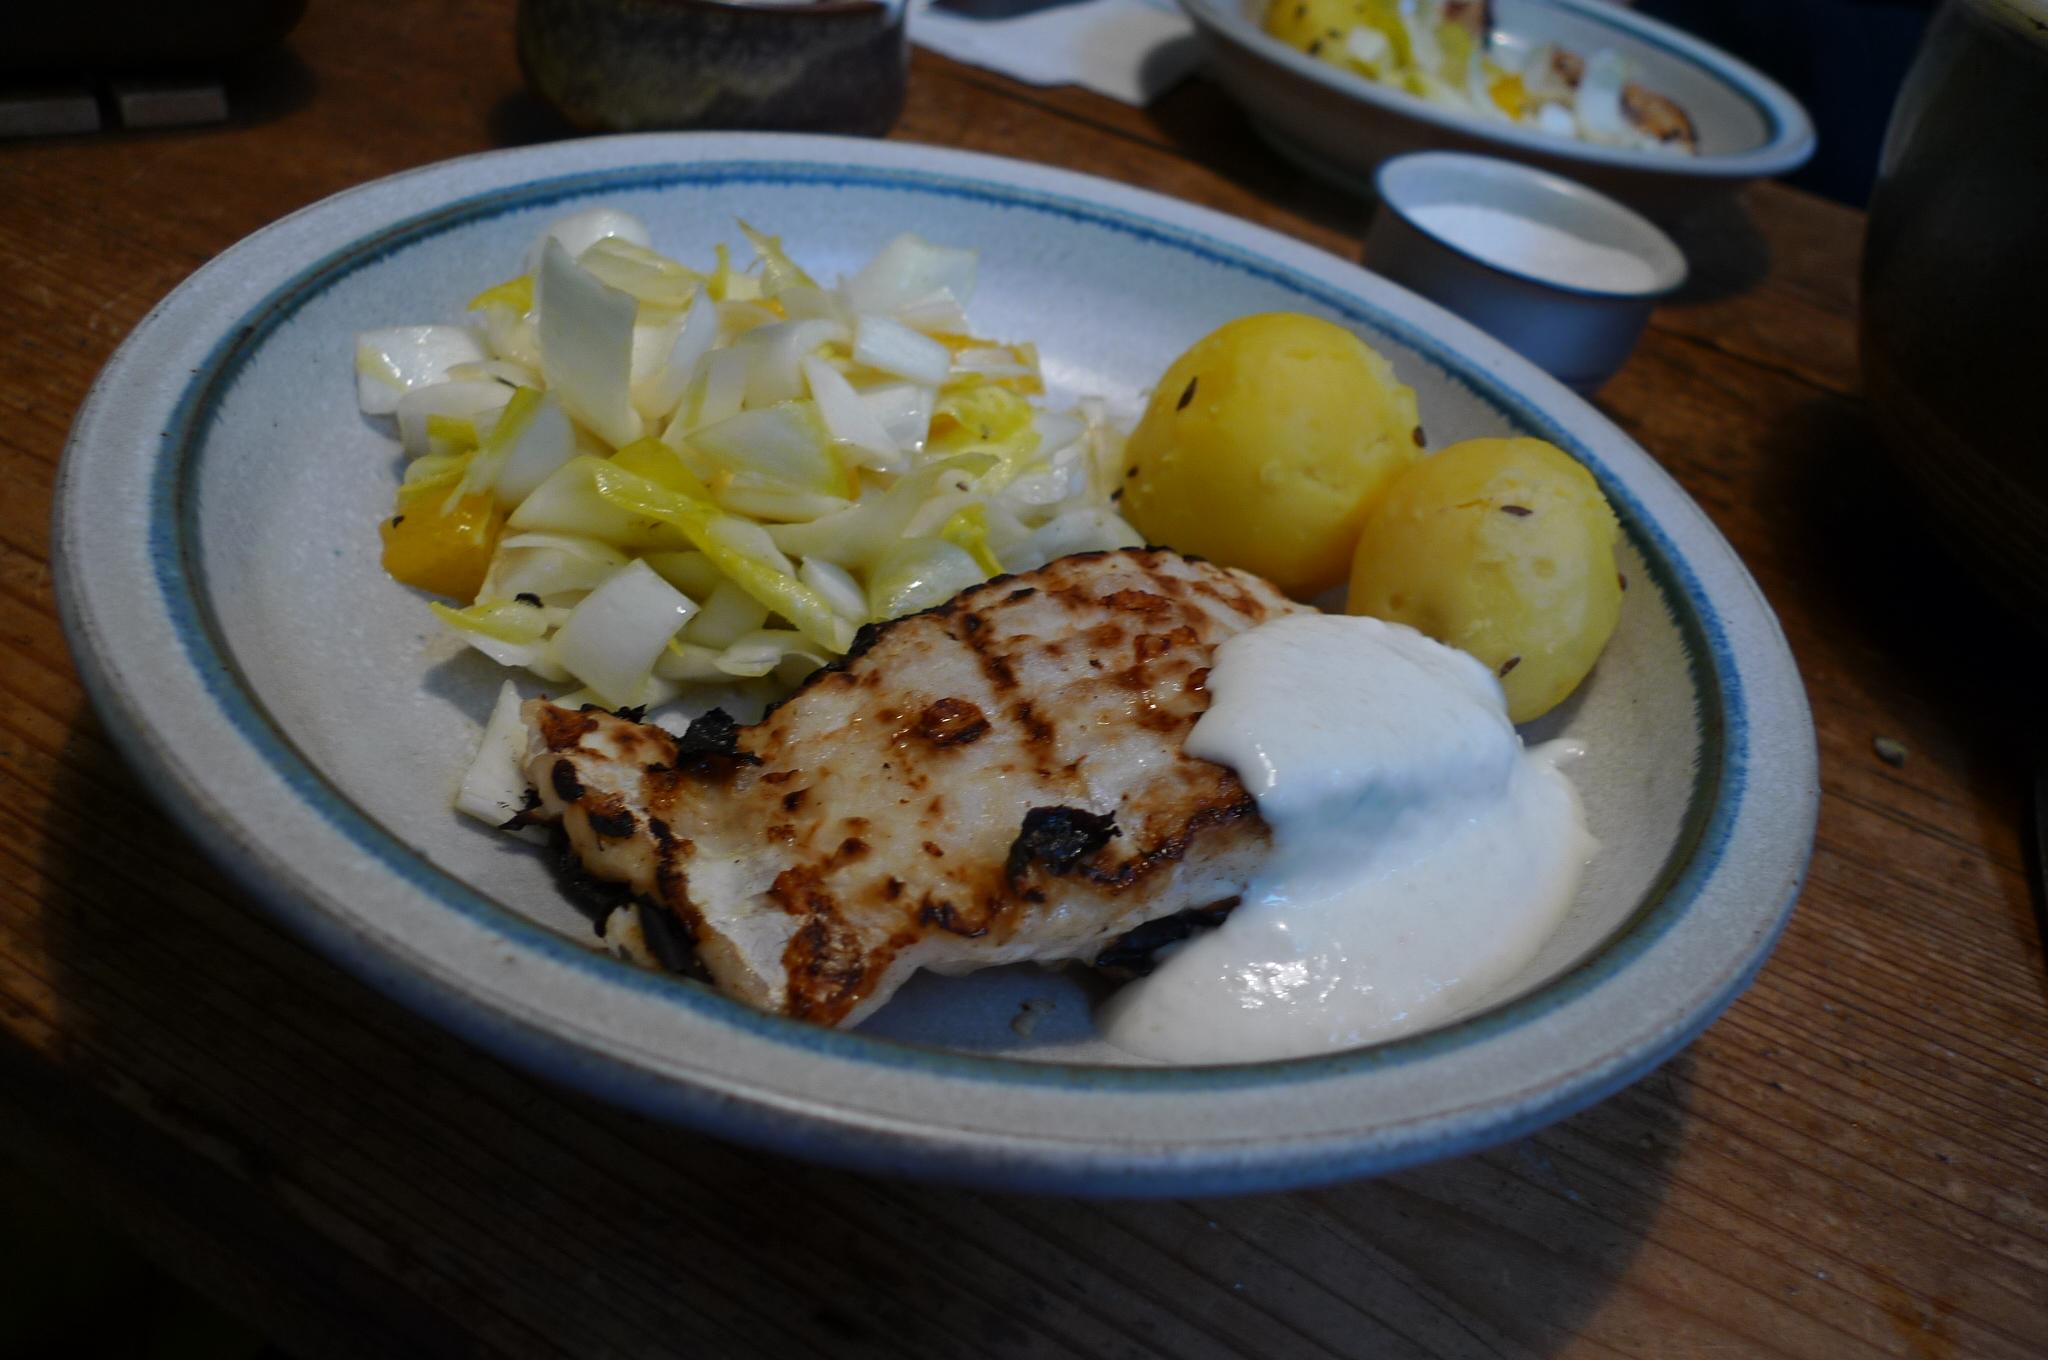 Kabeljau,Chicoreesalat,Kartoffeln,Quarkspeise - 17.2.15   (13)